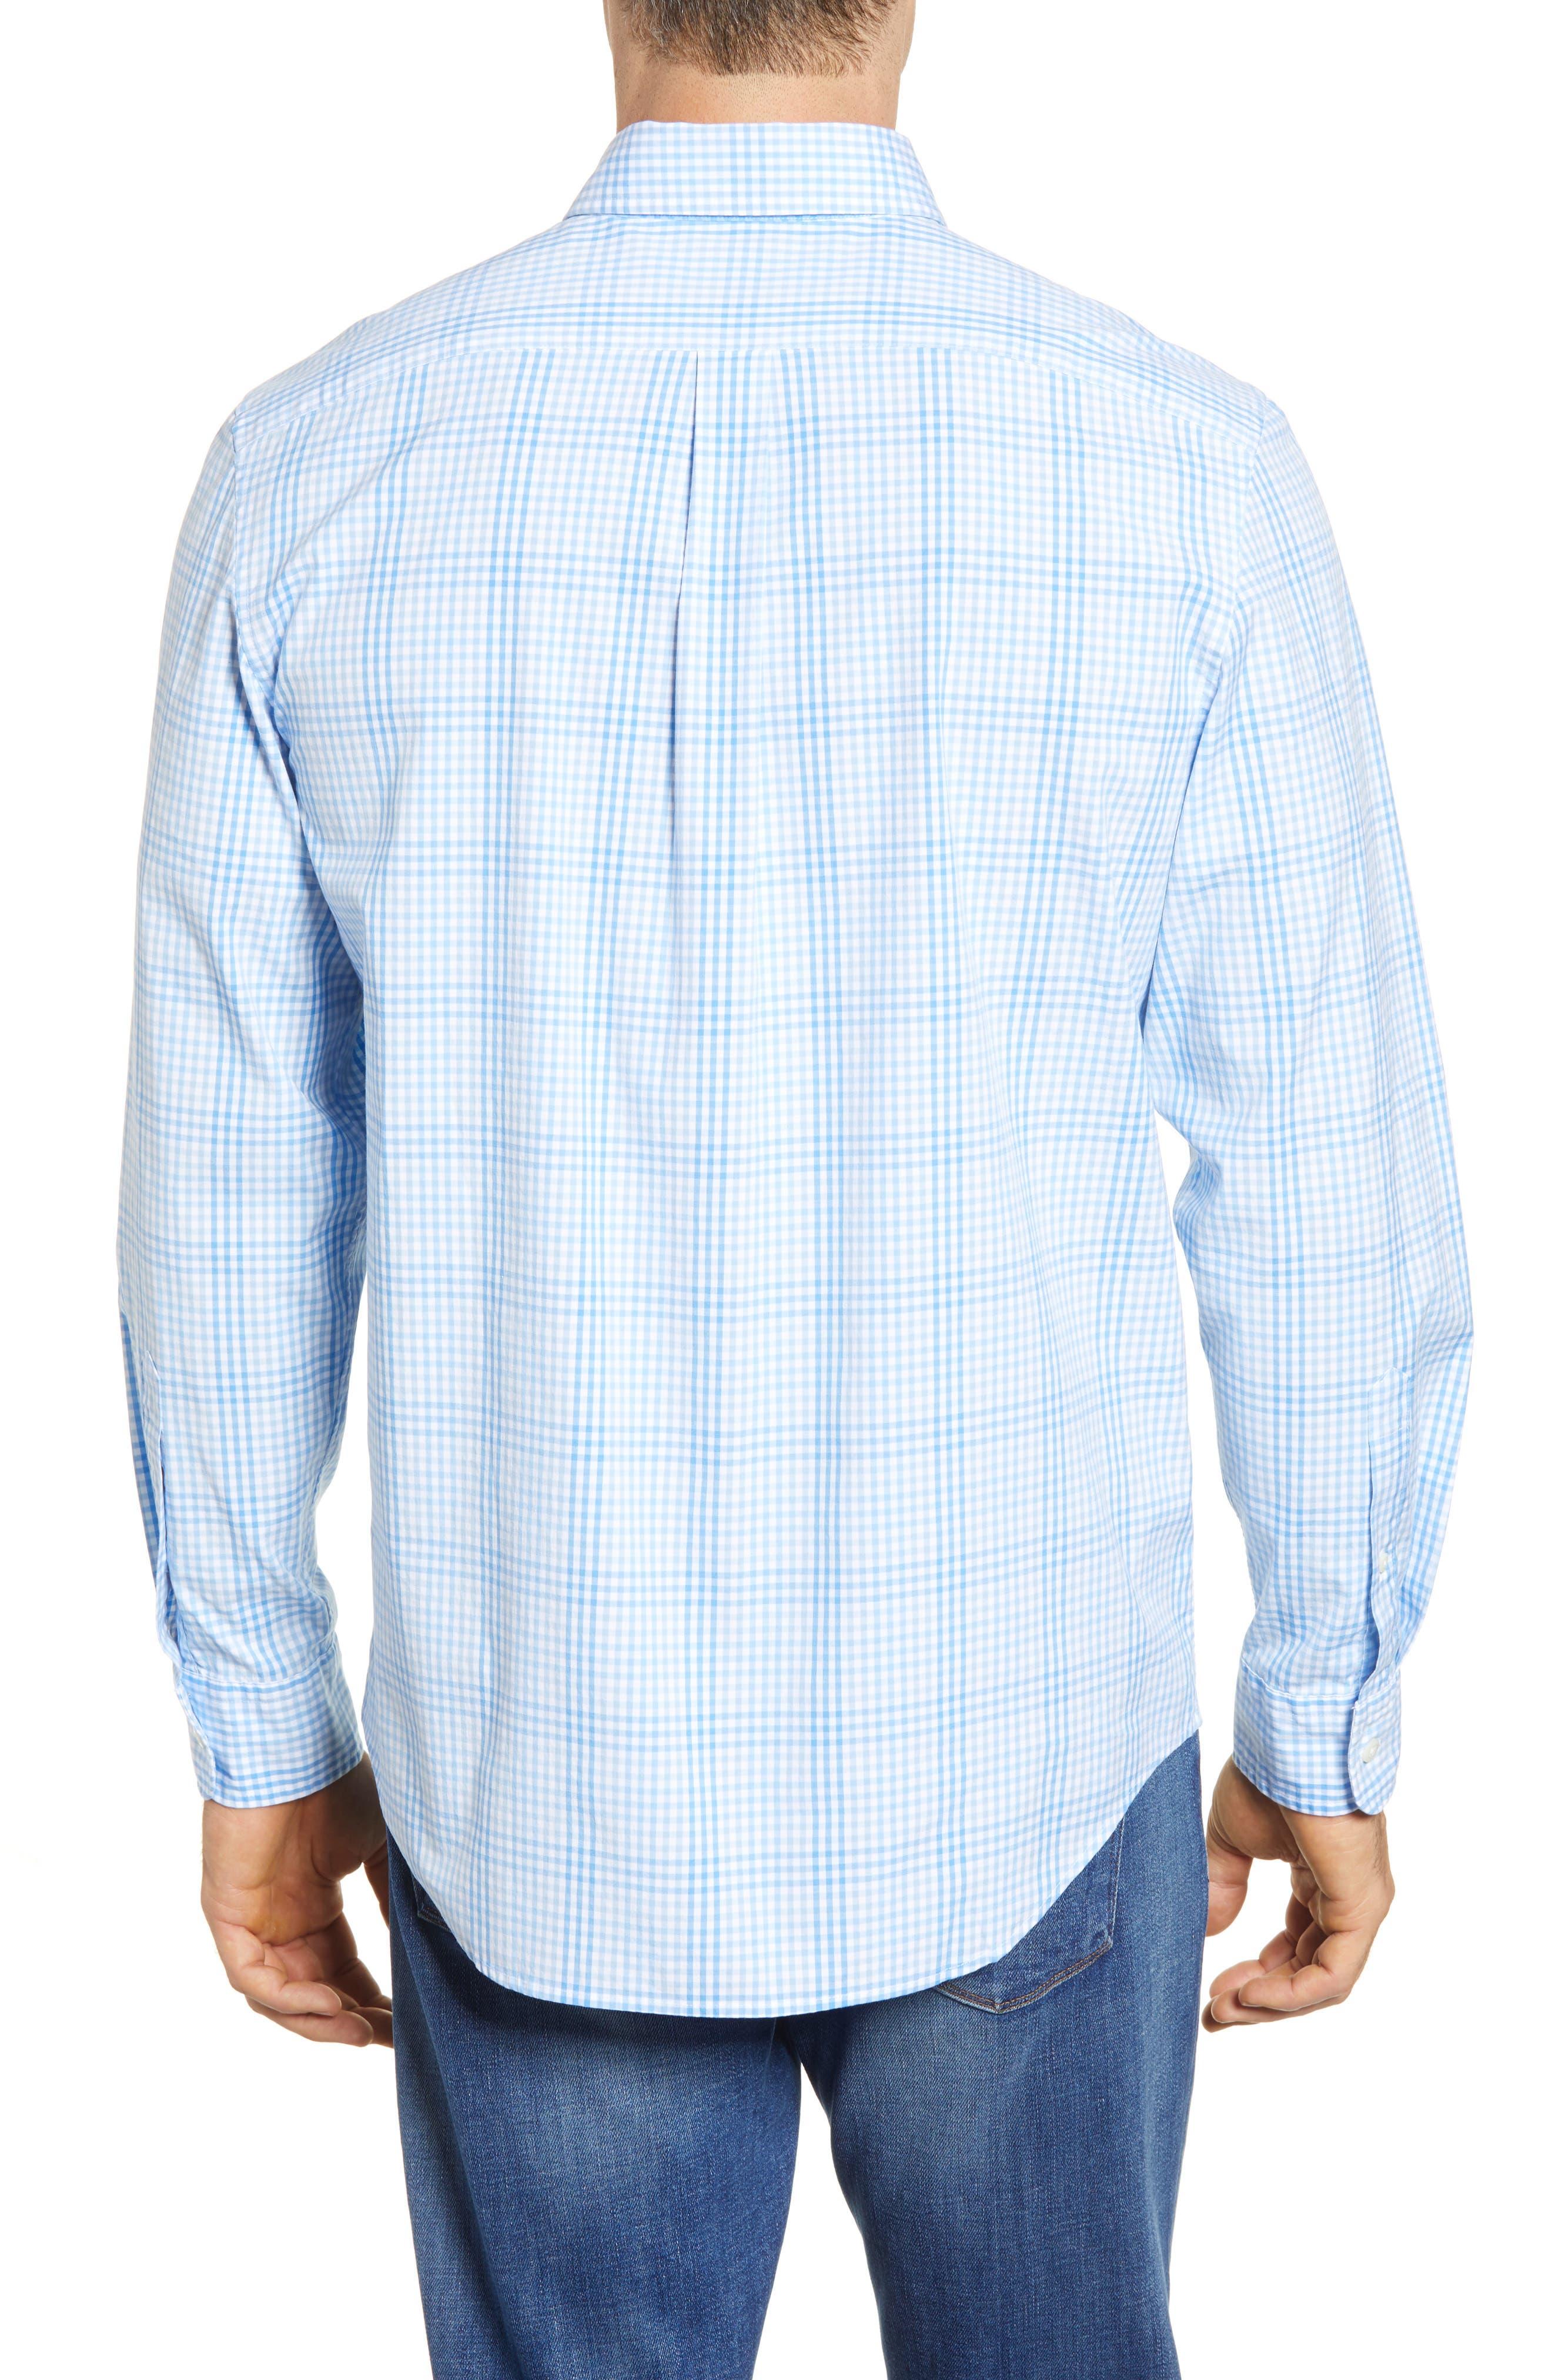 Ridge Hill Classic Fit Check Sport Shirt,                             Alternate thumbnail 3, color,                             Harbor Cay